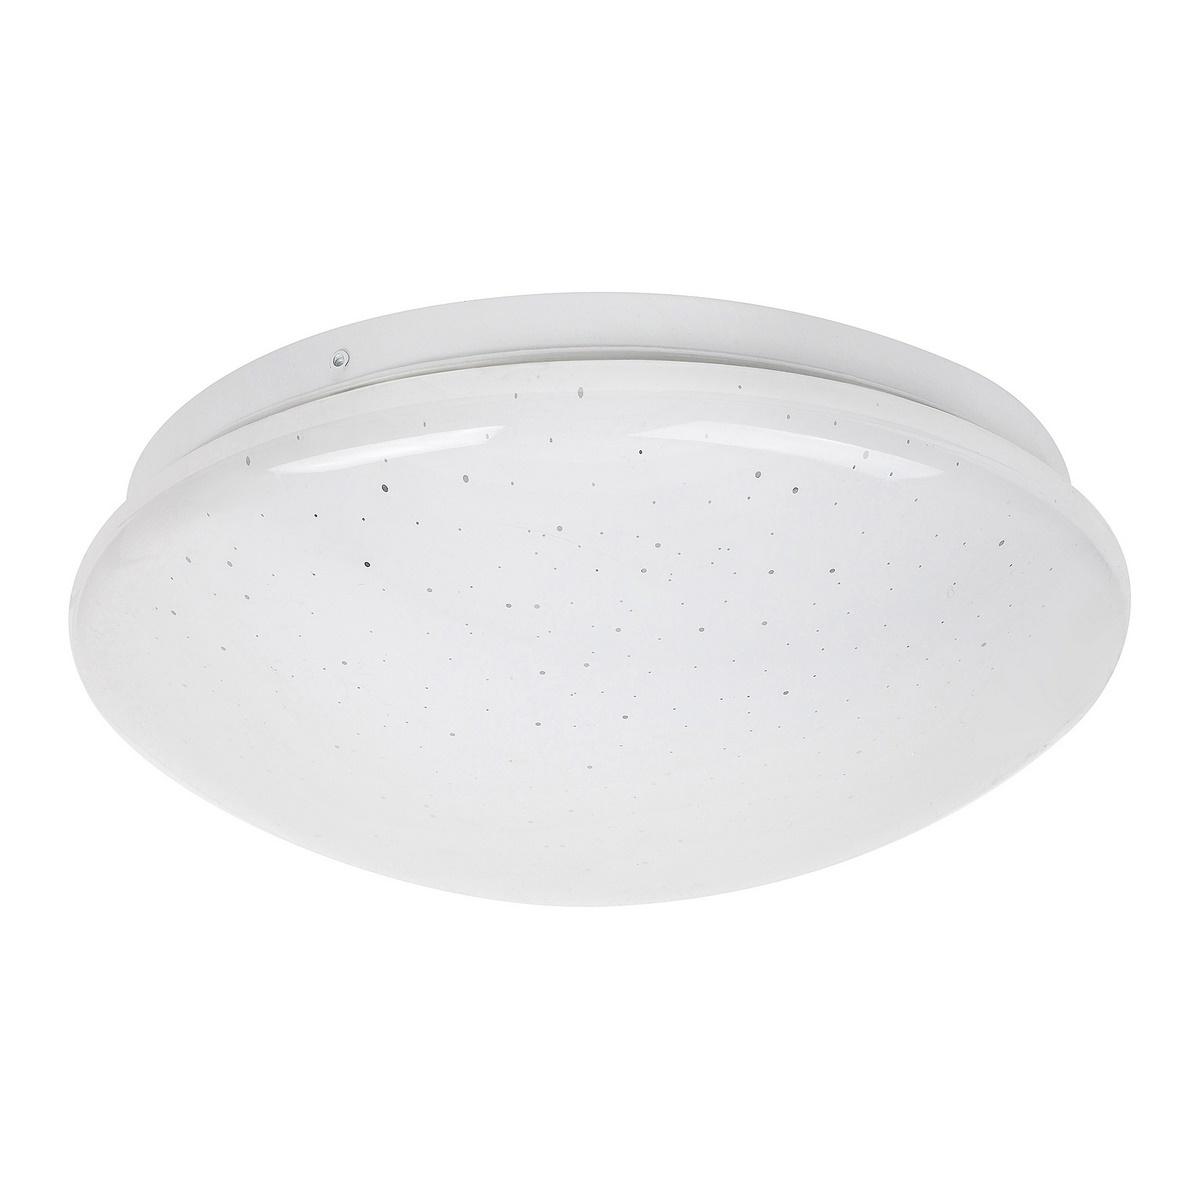 Rabalux 3936 Lucas Lampa sufitowa LED biały, śr. 26 cm